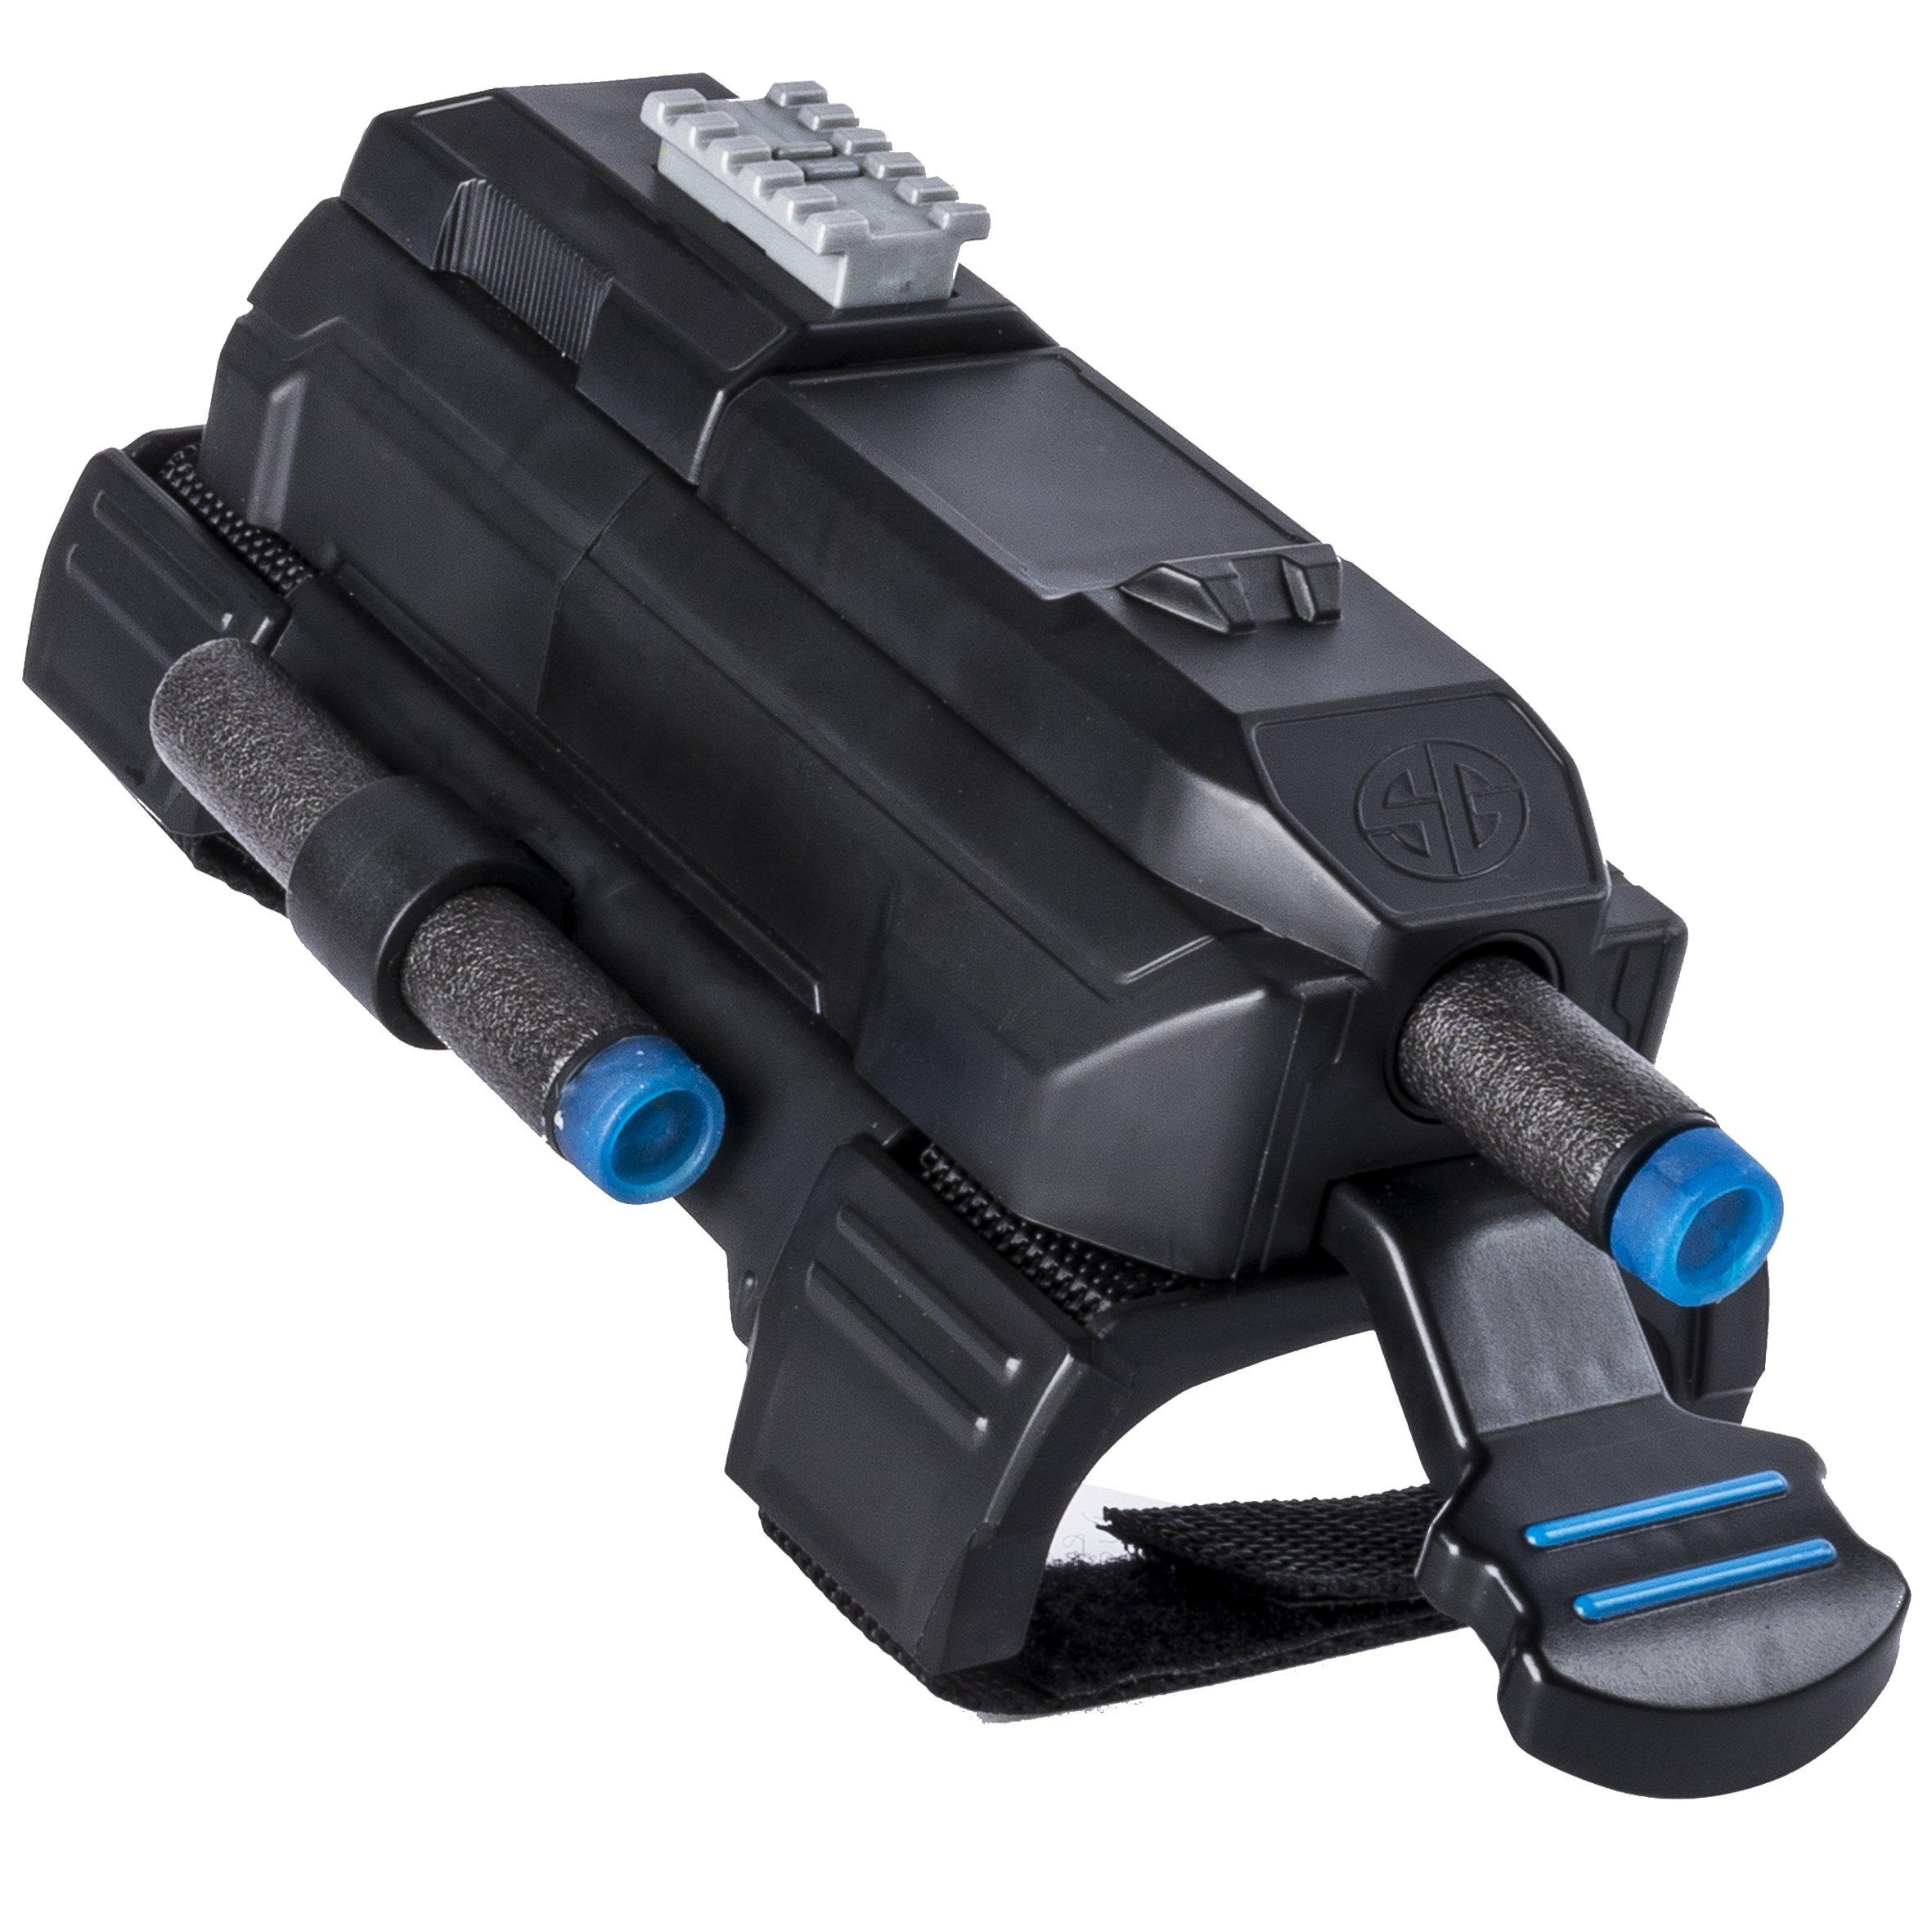 Spy Gear 6033009 Ninja Wrist Blaster by Spy Gear (Image #4)